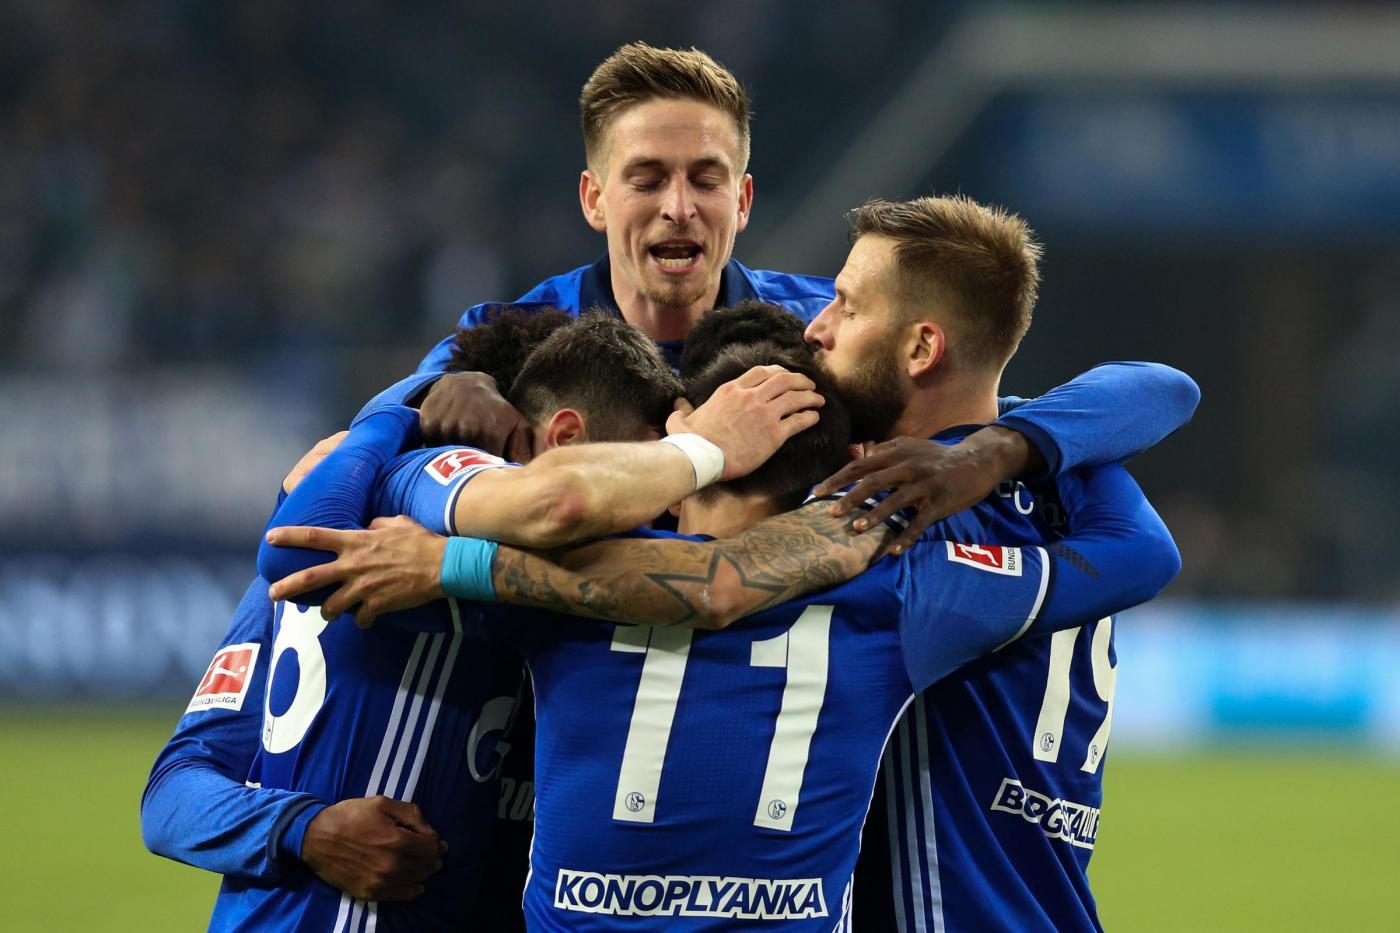 Schalke 04-Wolfsburg mercoledì 7 febbraio, analisi e pronostico DFB Pokal